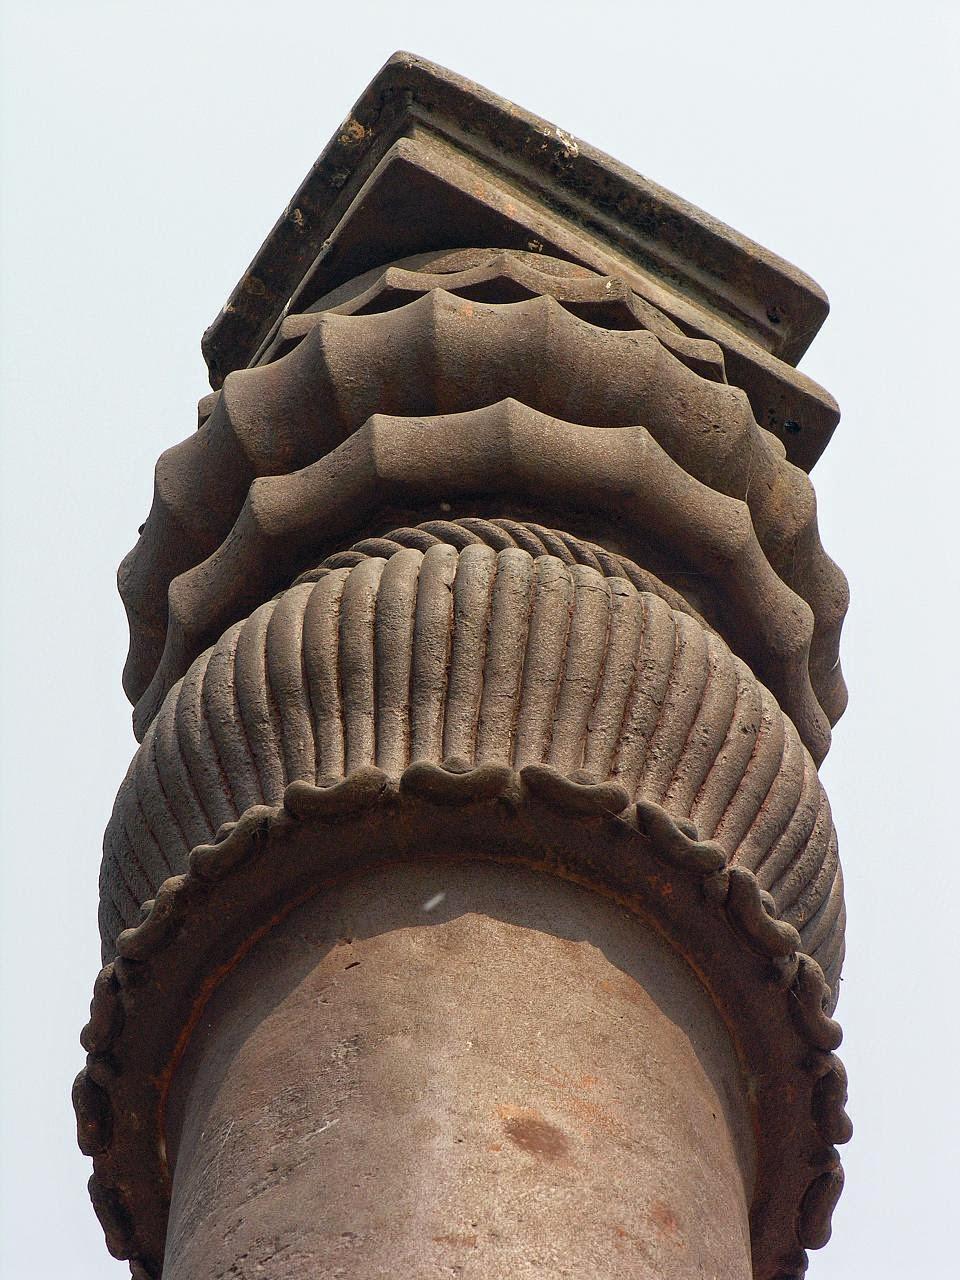 Details of the top of iron pillar of Delhi